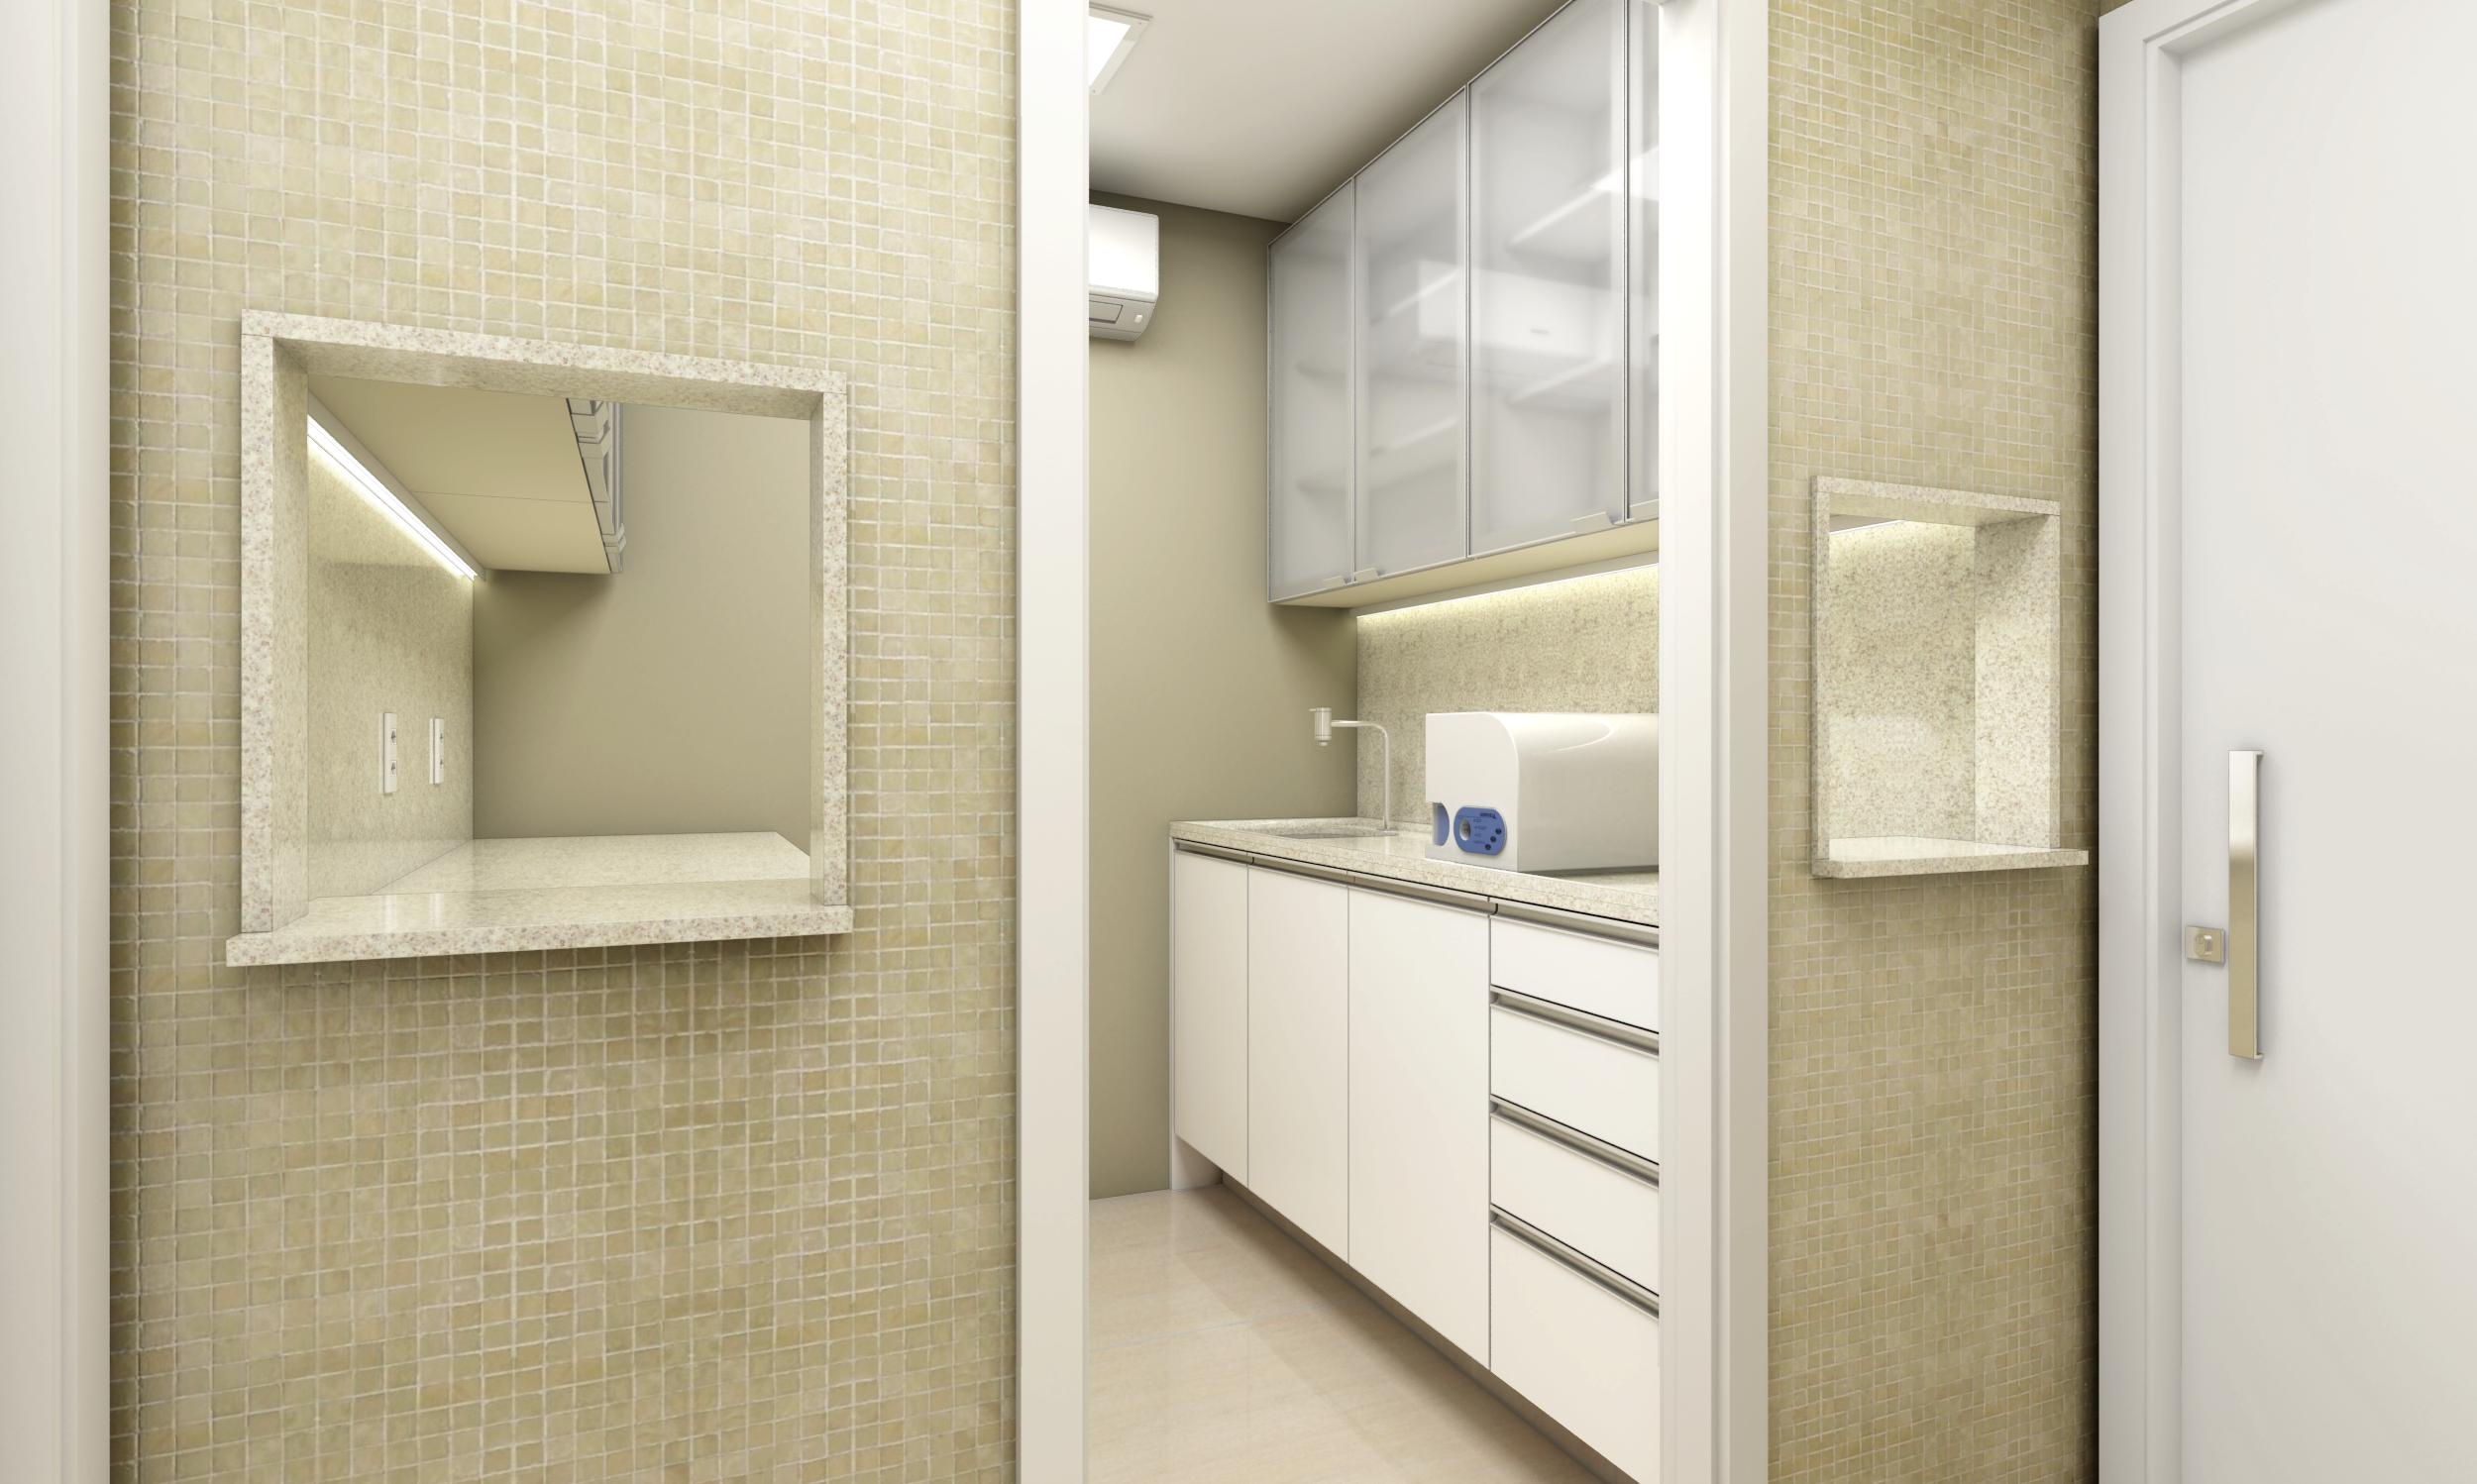 Artesanato Yotube ~ Projeto armário planejado, consultório odontológico